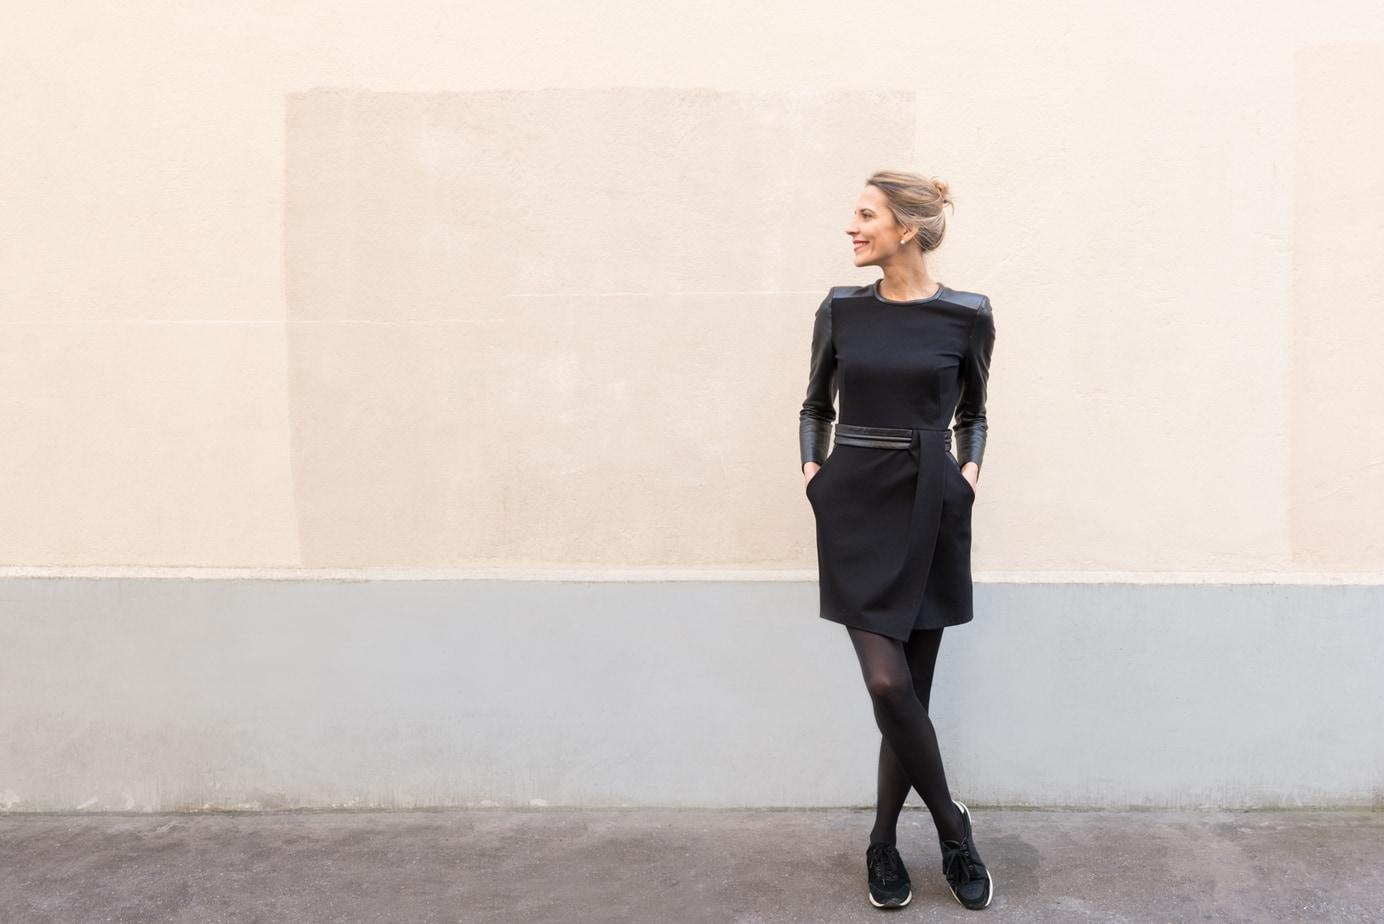 la petite robe noire le dressing id al. Black Bedroom Furniture Sets. Home Design Ideas